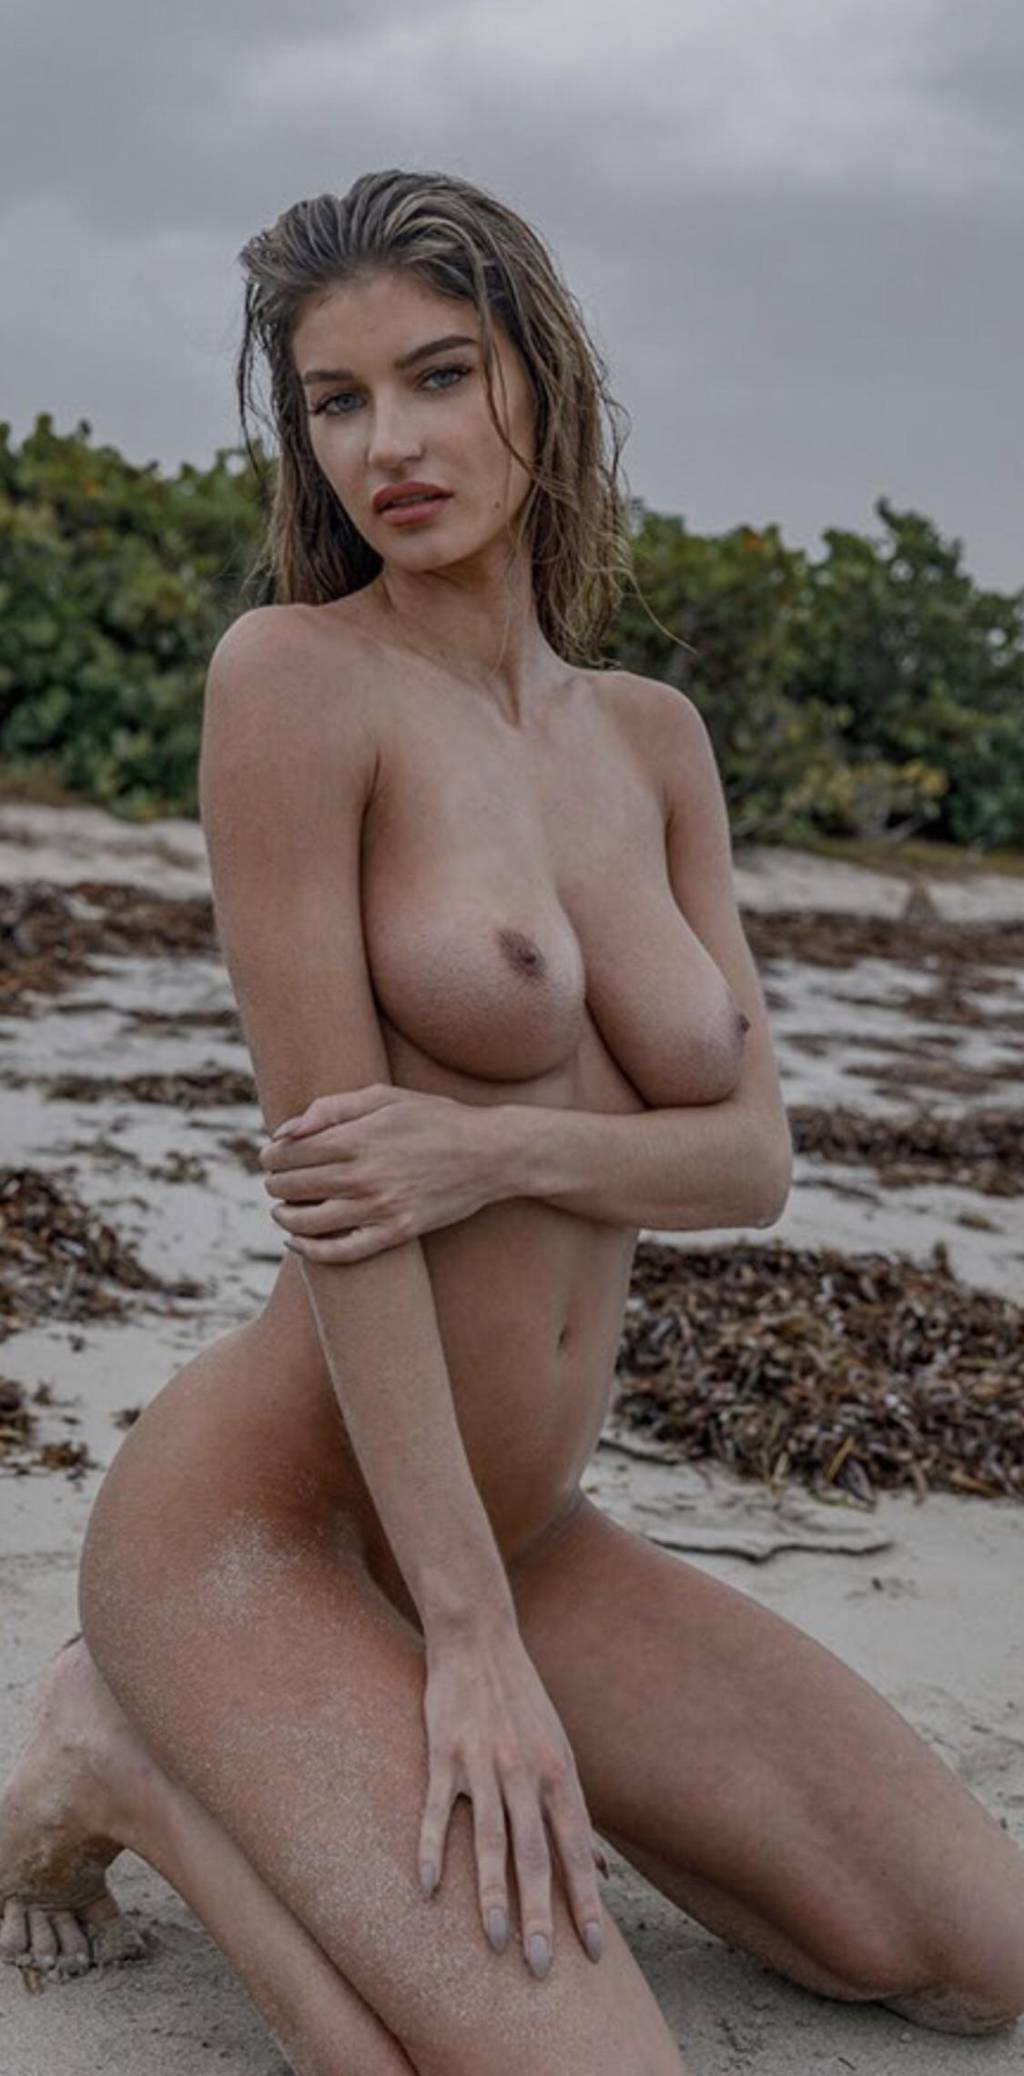 Haley nude